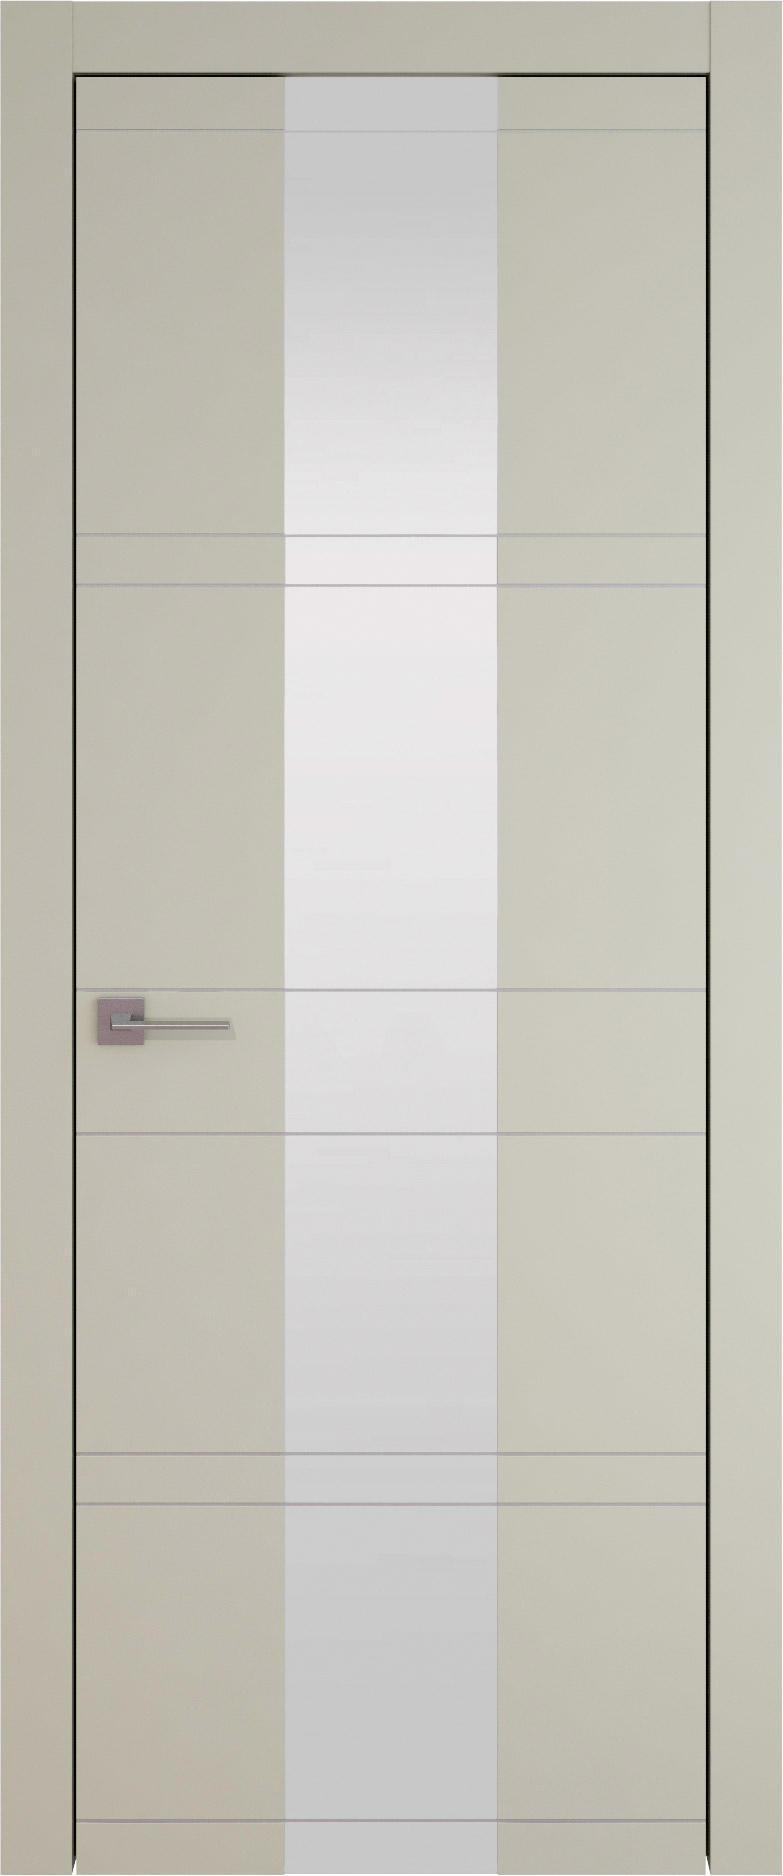 Tivoli Ж-2 цвет - Серо-оливковая эмаль (RAL 7032) Со стеклом (ДО)